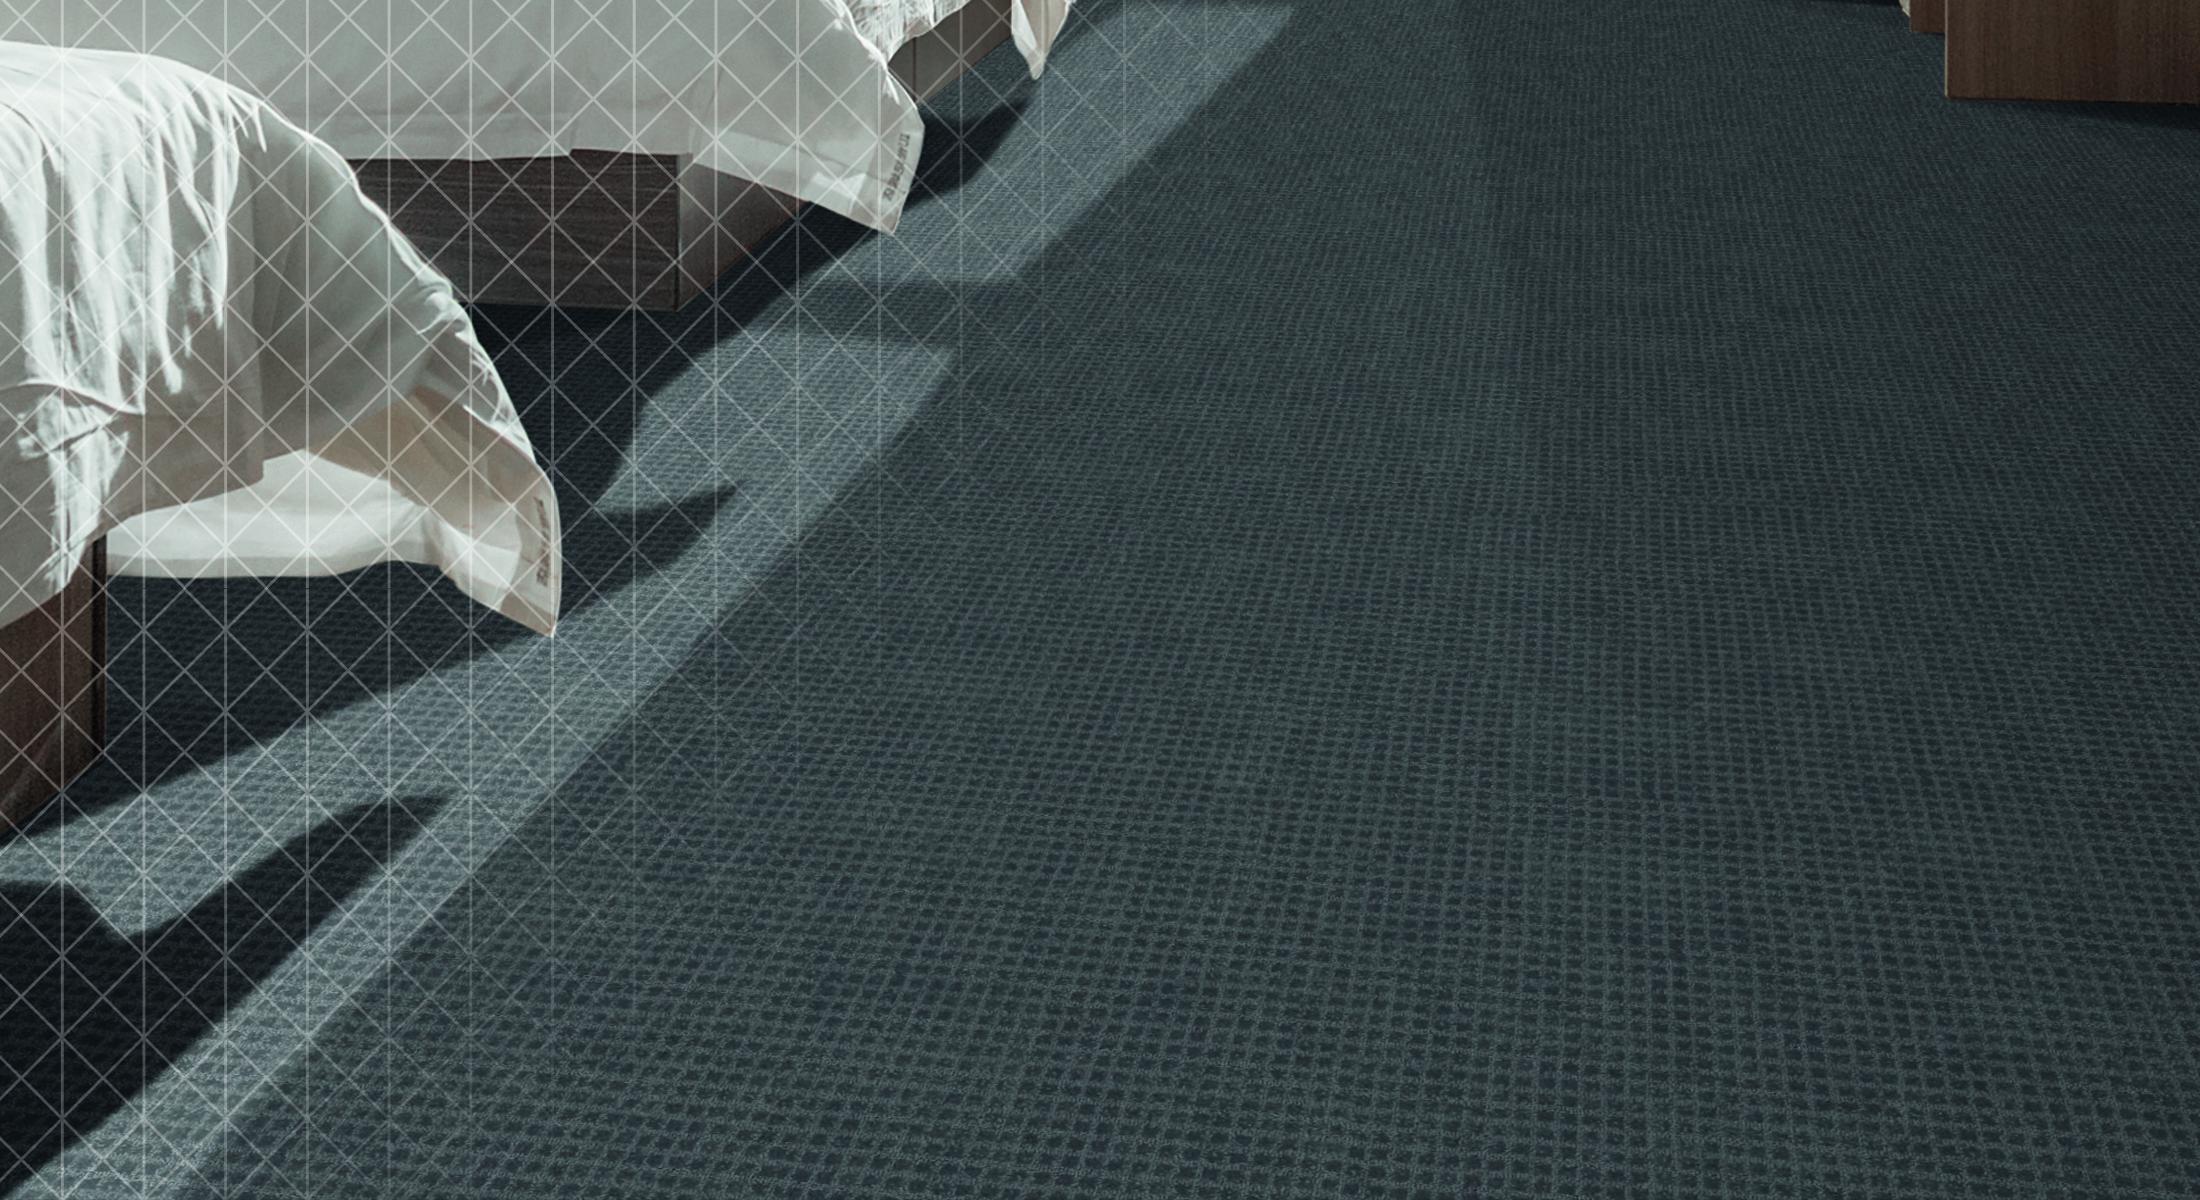 tapis mto - Naviguez parmi nos tapis pleine largeur stock et MTO